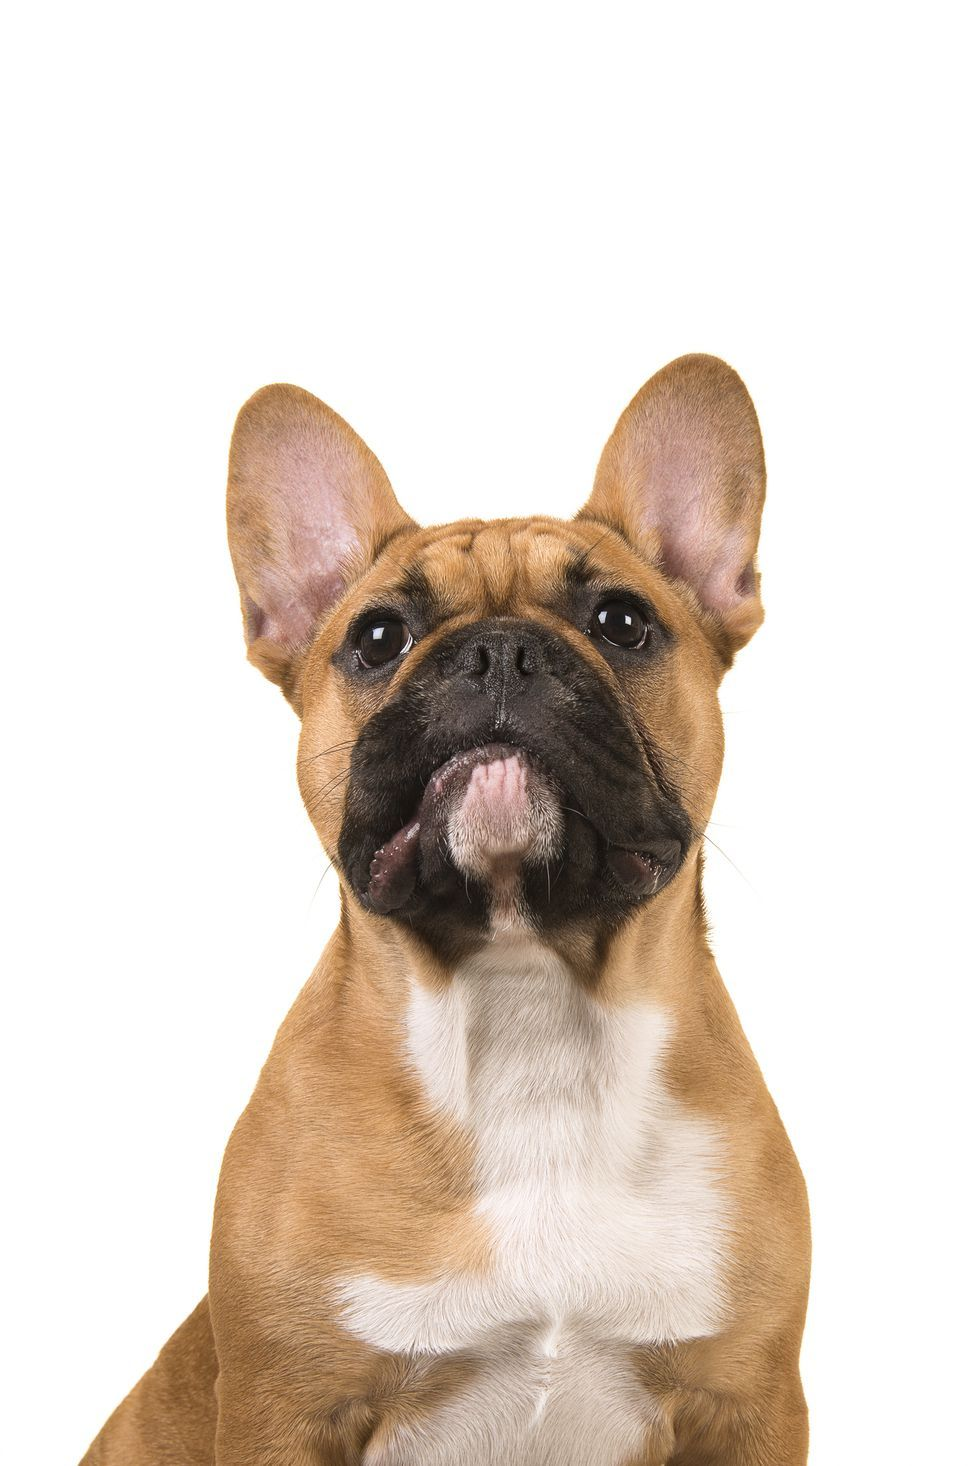 20 Funny Dog Names For Your Playful Pup Funny Dog Names Dog